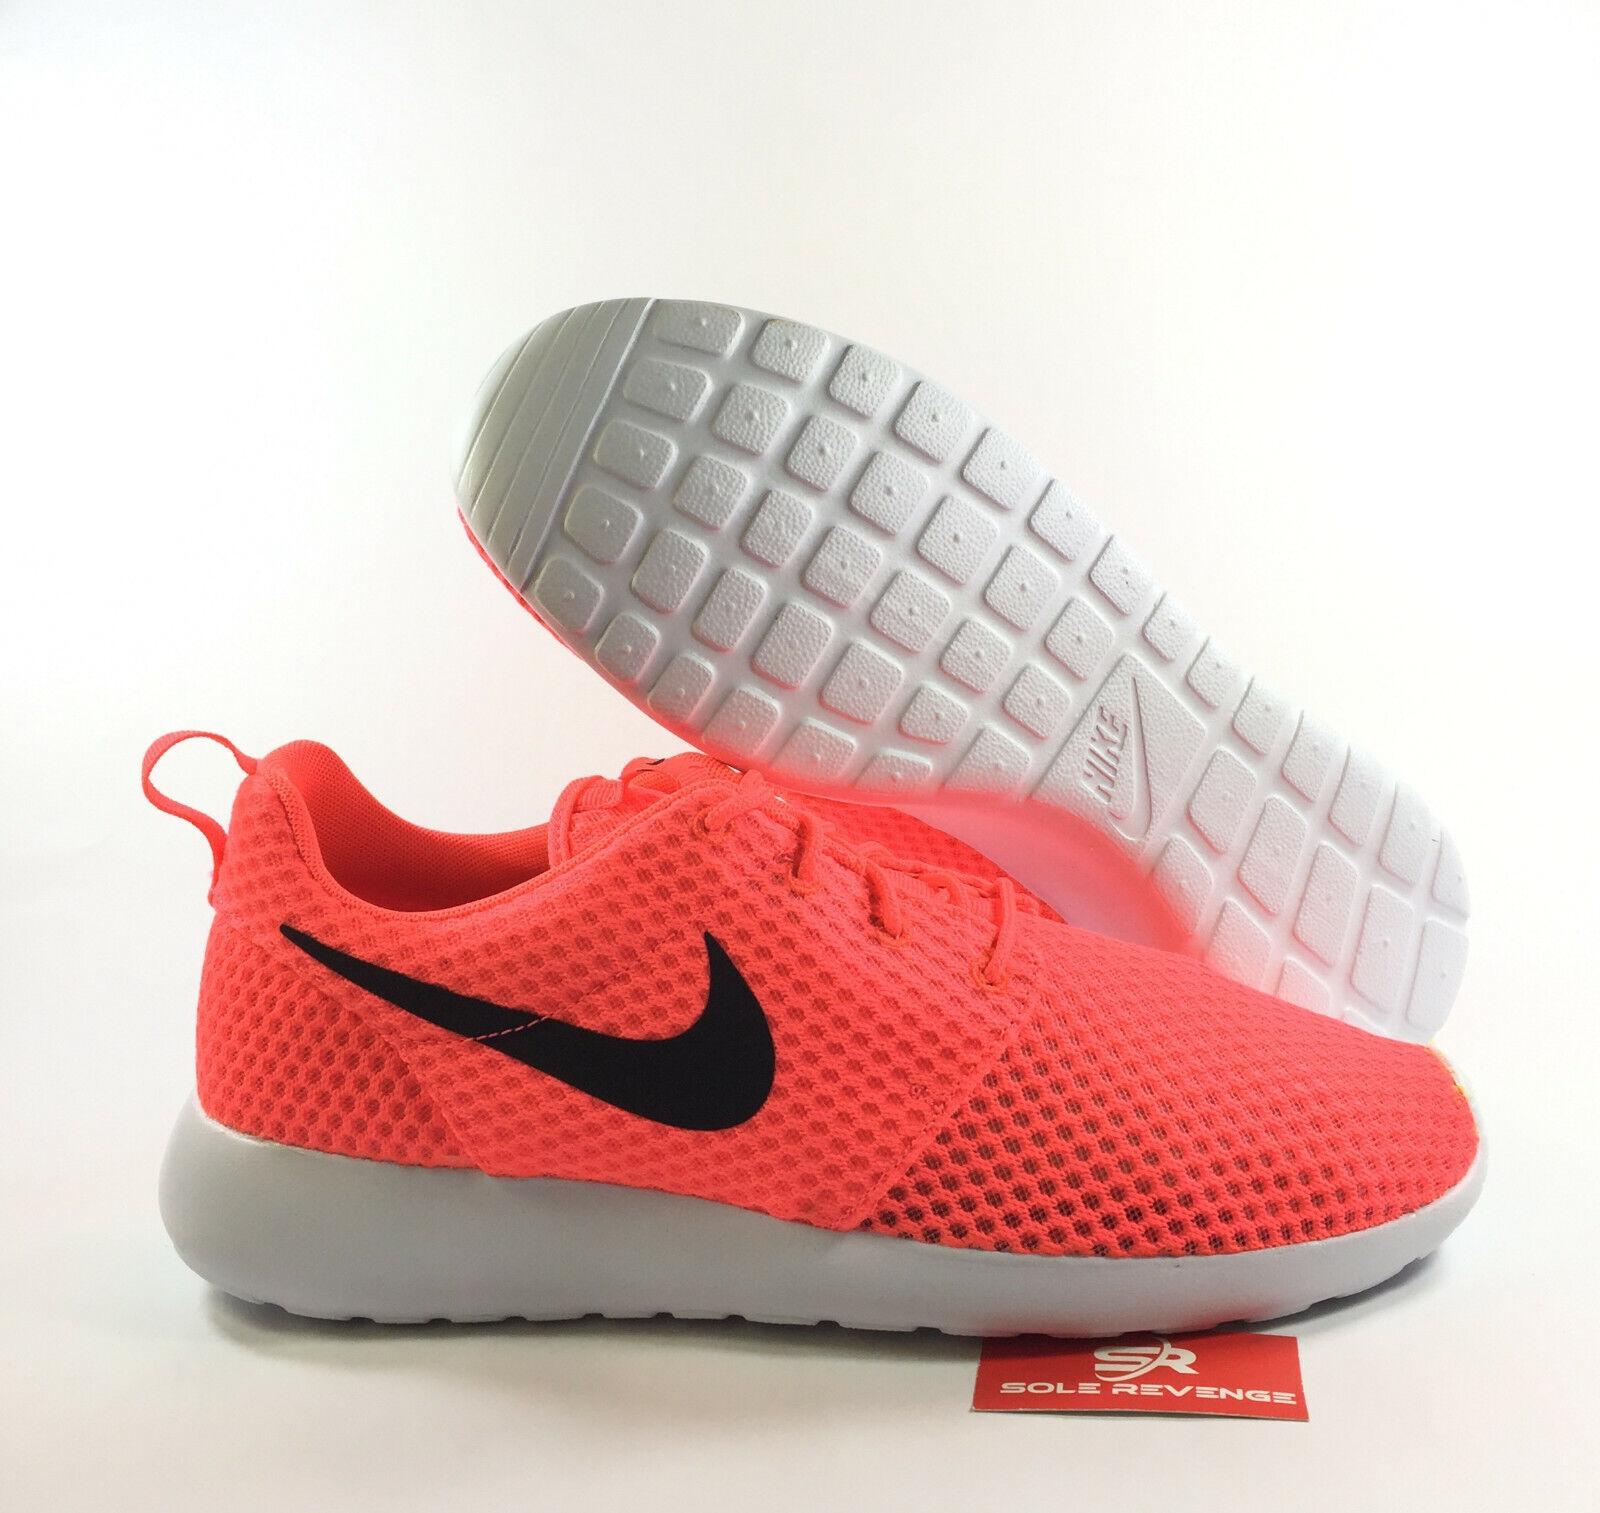 NEW 11.5 Nike Roshe One Breeze BR Run shoes shoes shoes Hot Lava Black Rosherun 718552-801 7c0f70